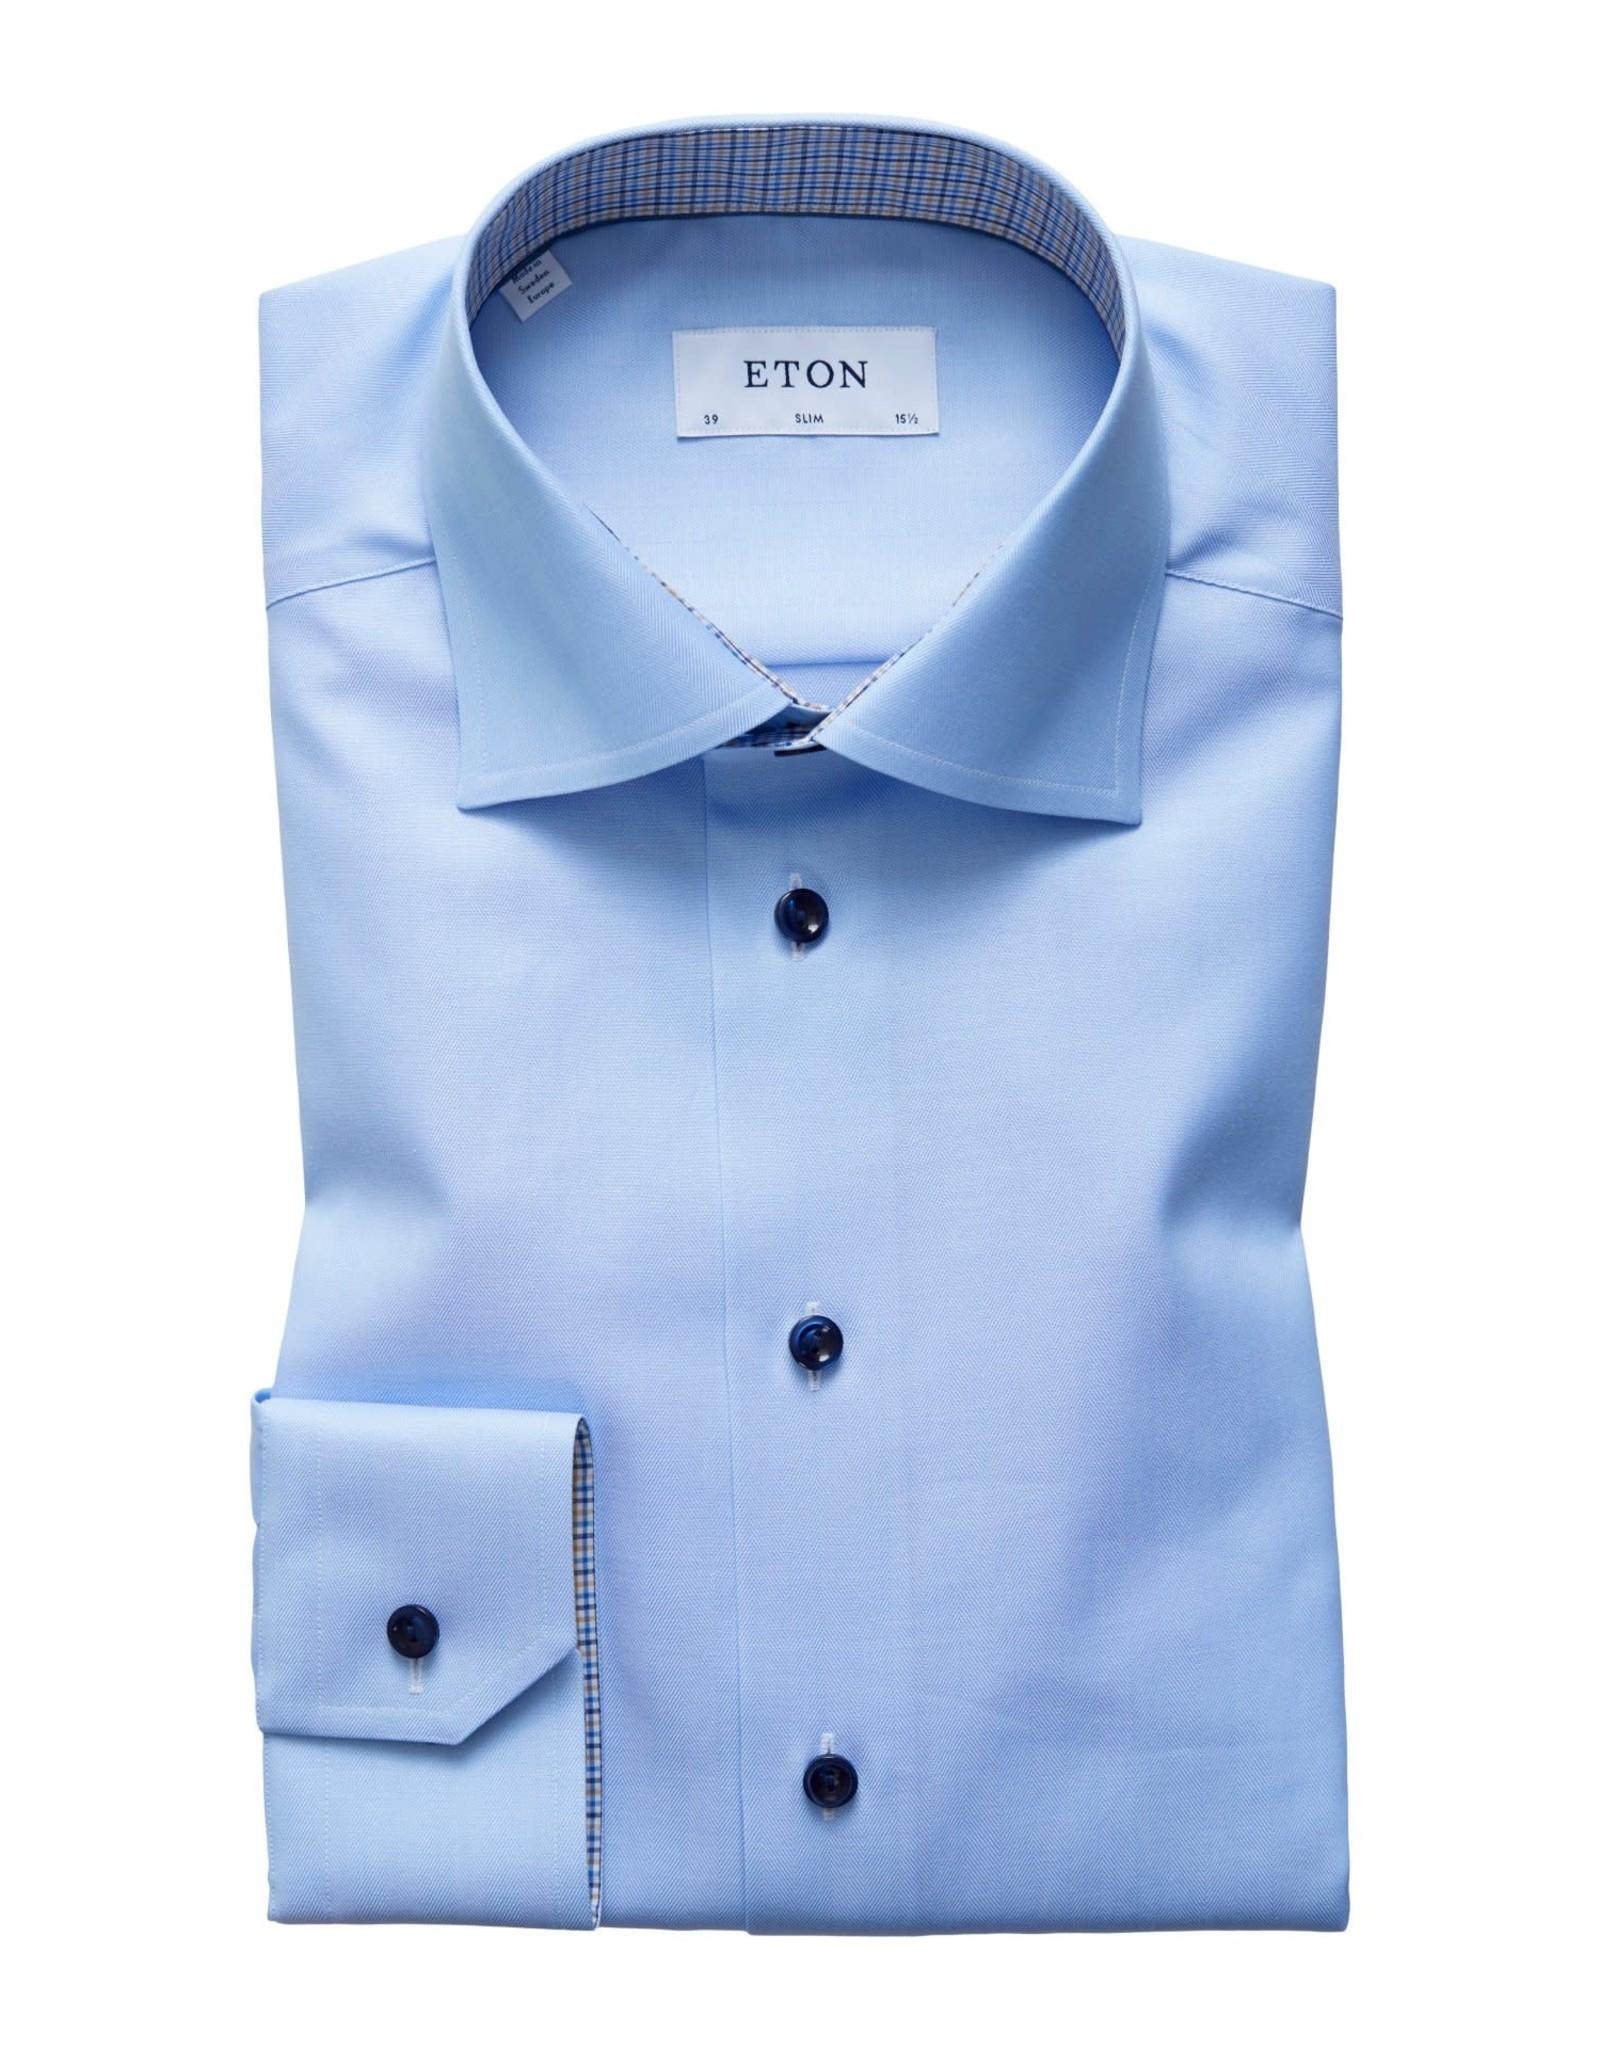 Eton Eton hemd blauw slim 3010-00561/22